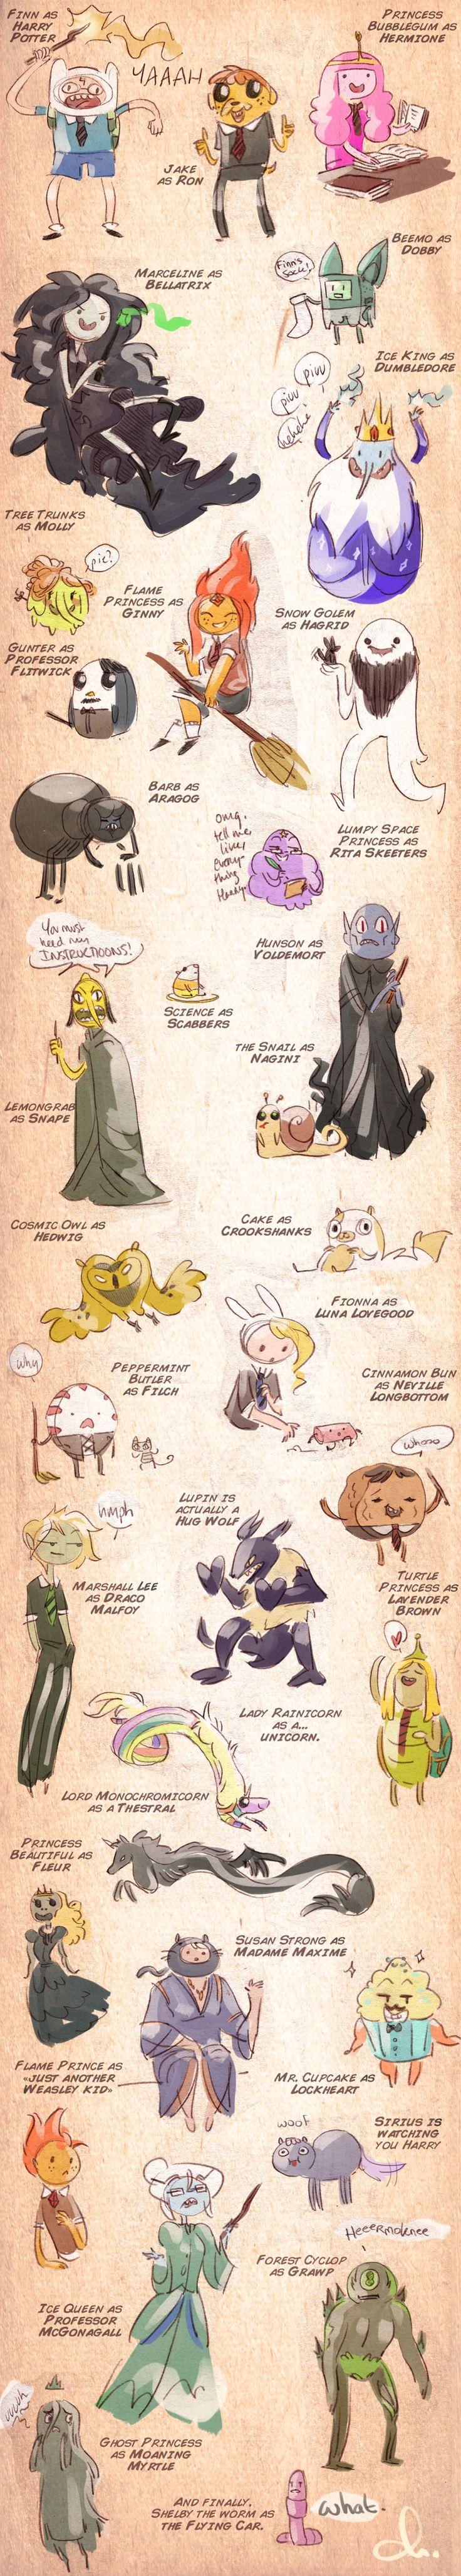 Hora de Aventuras + Harry Potter. Grande. :)